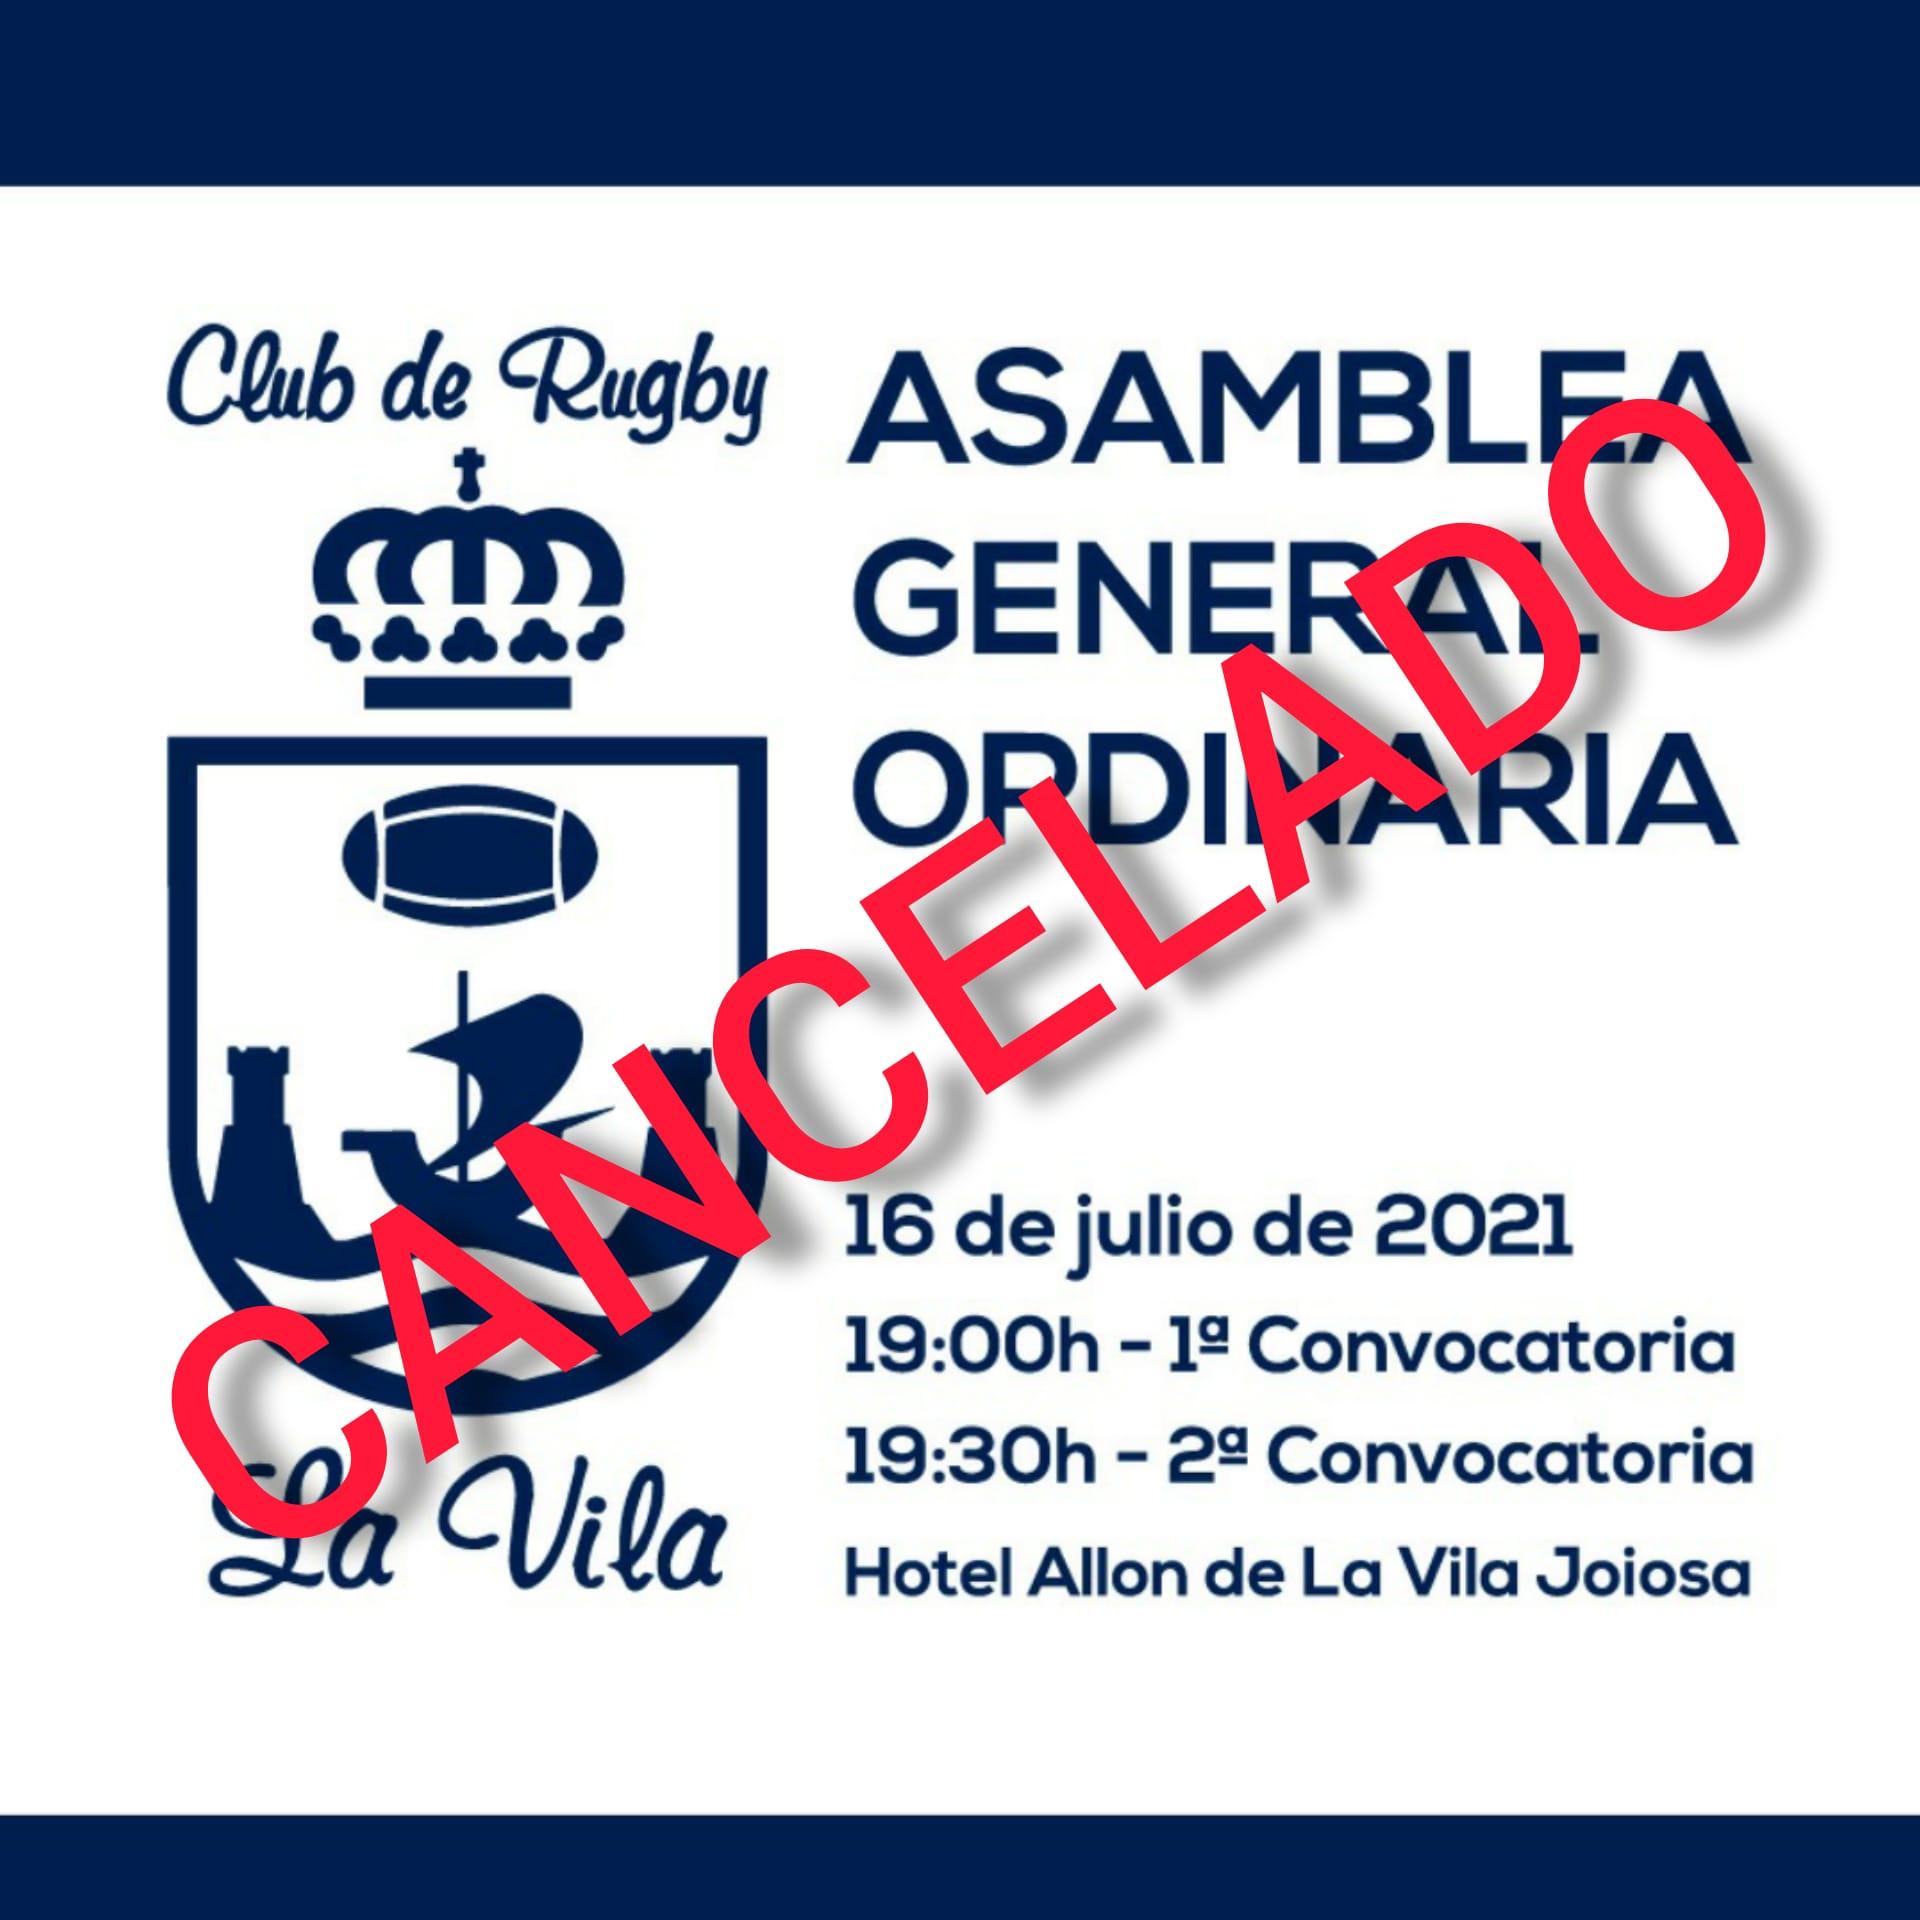 Asamblea cancelada